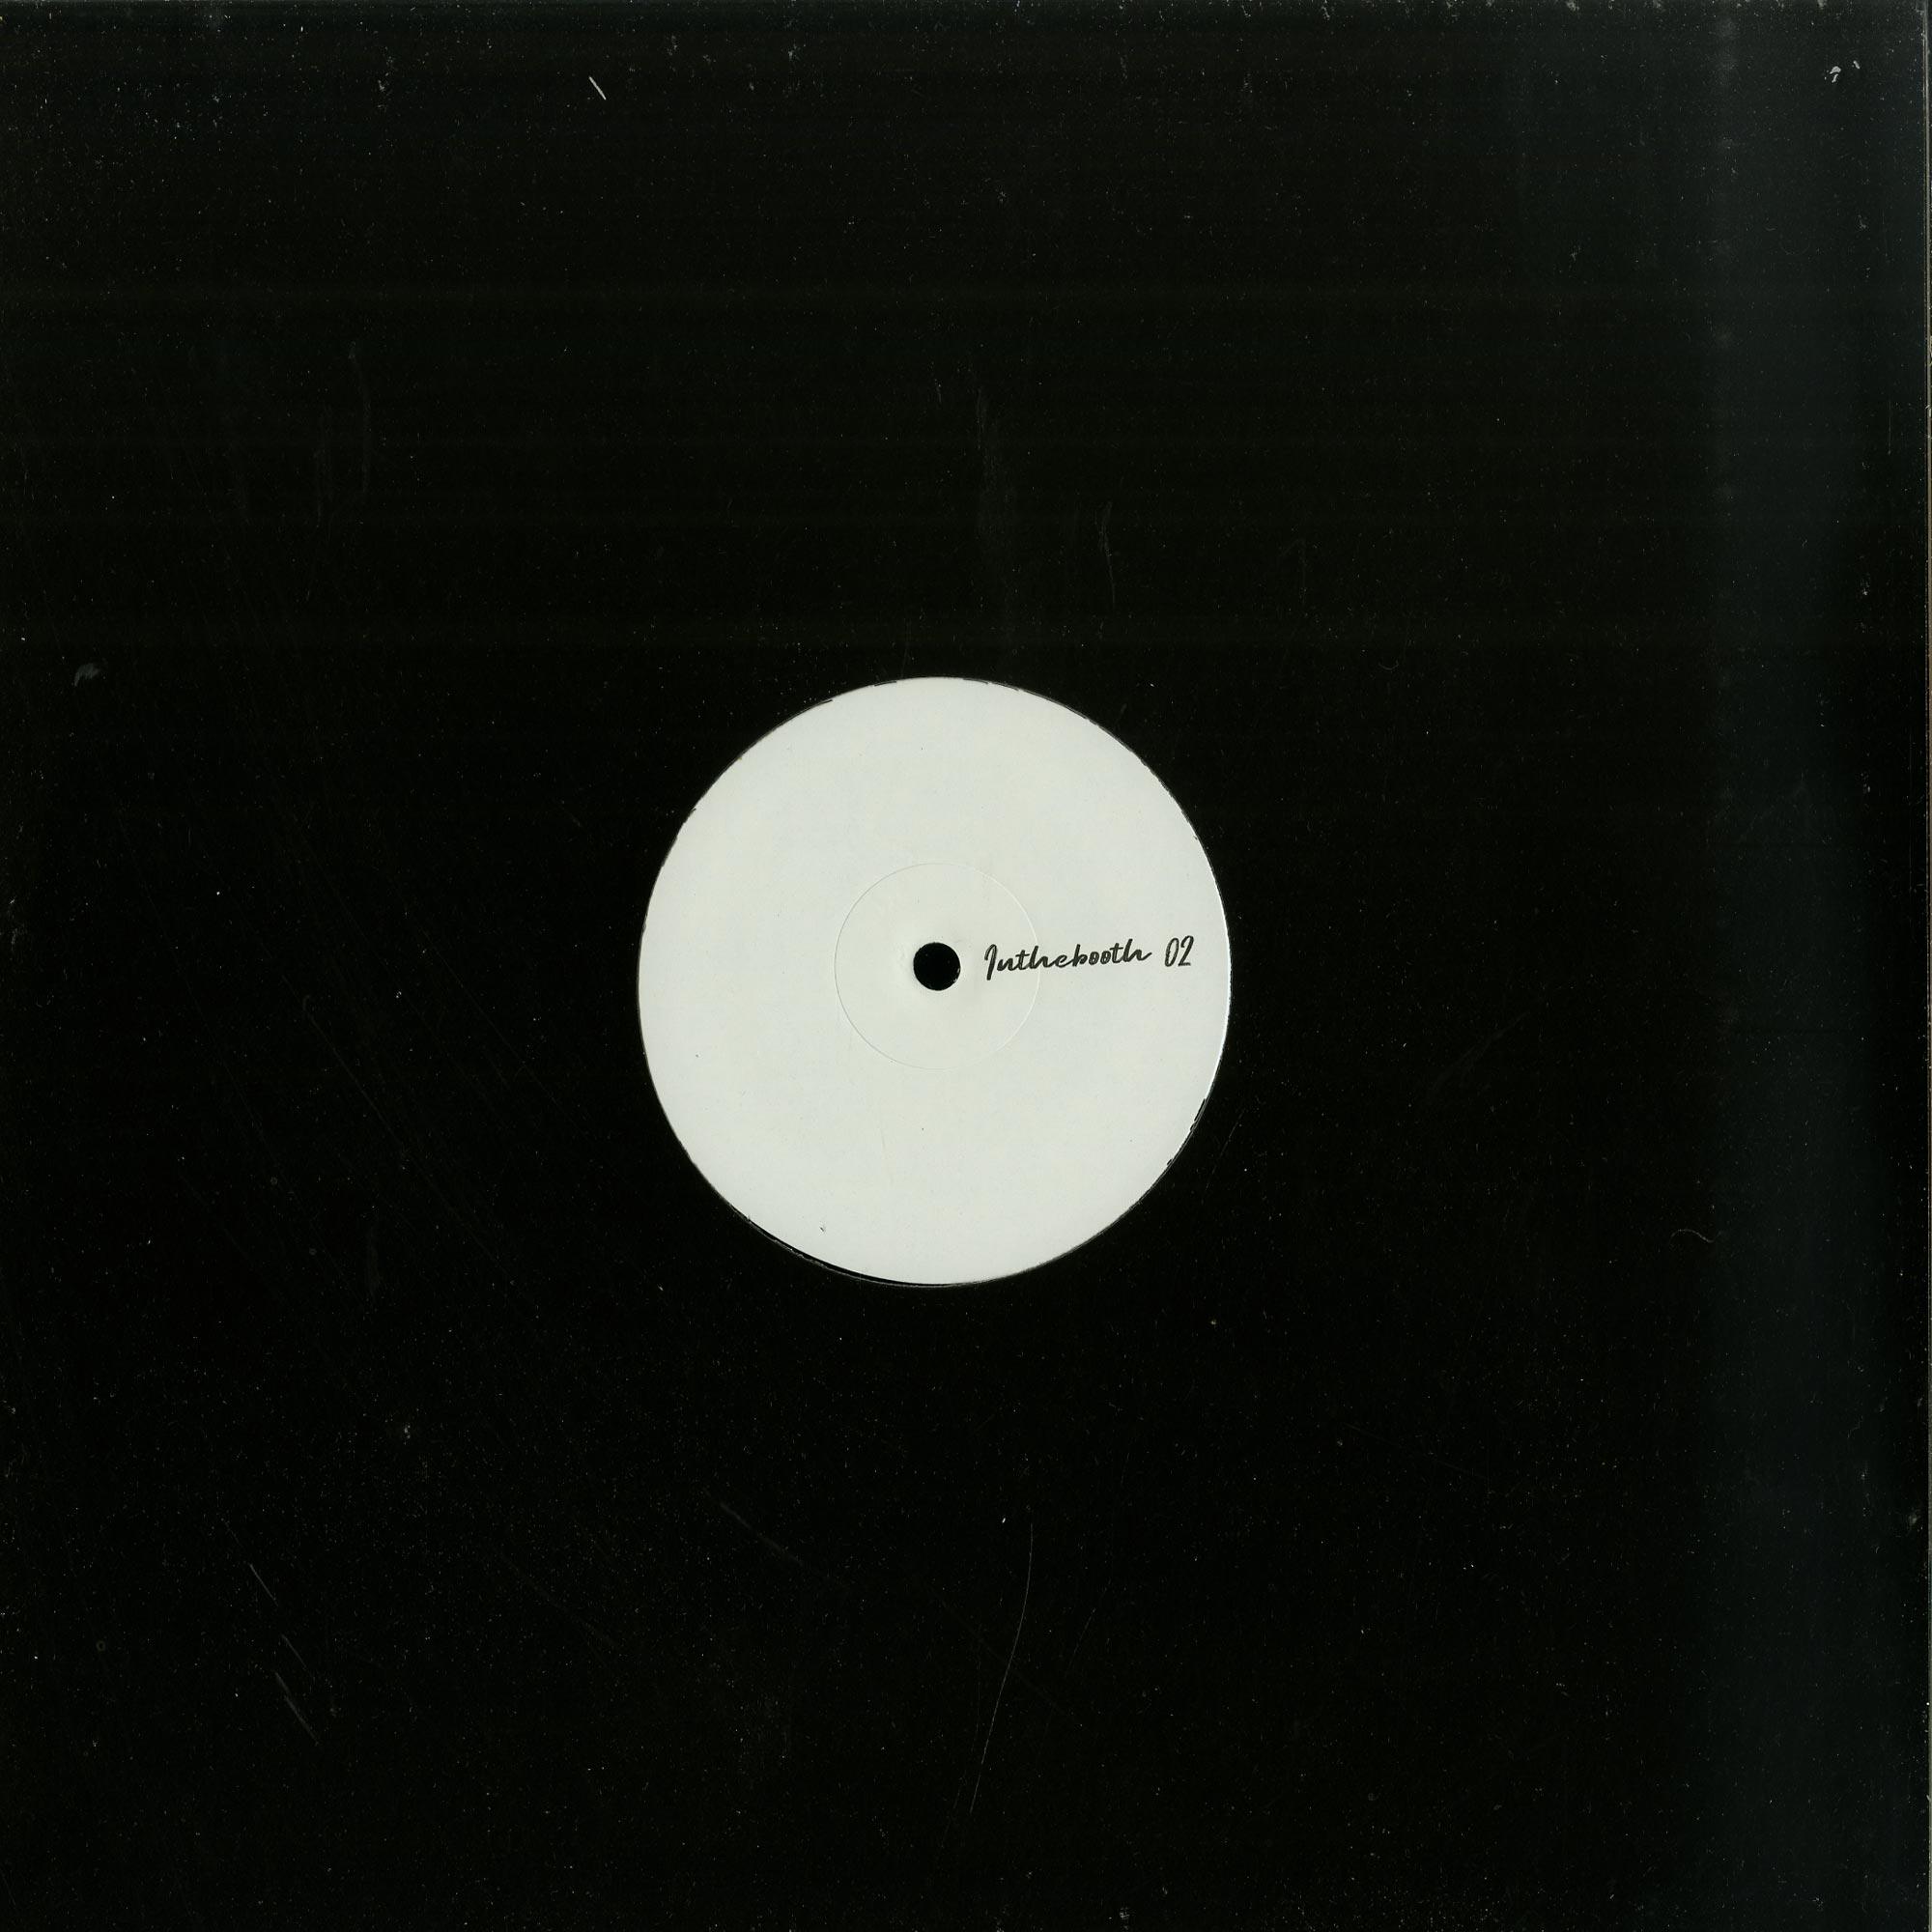 Paolo Rocco, Stevn.Aint.Leavn, Matt J. Dub, Chris Stussy - INTHEBOOTH02